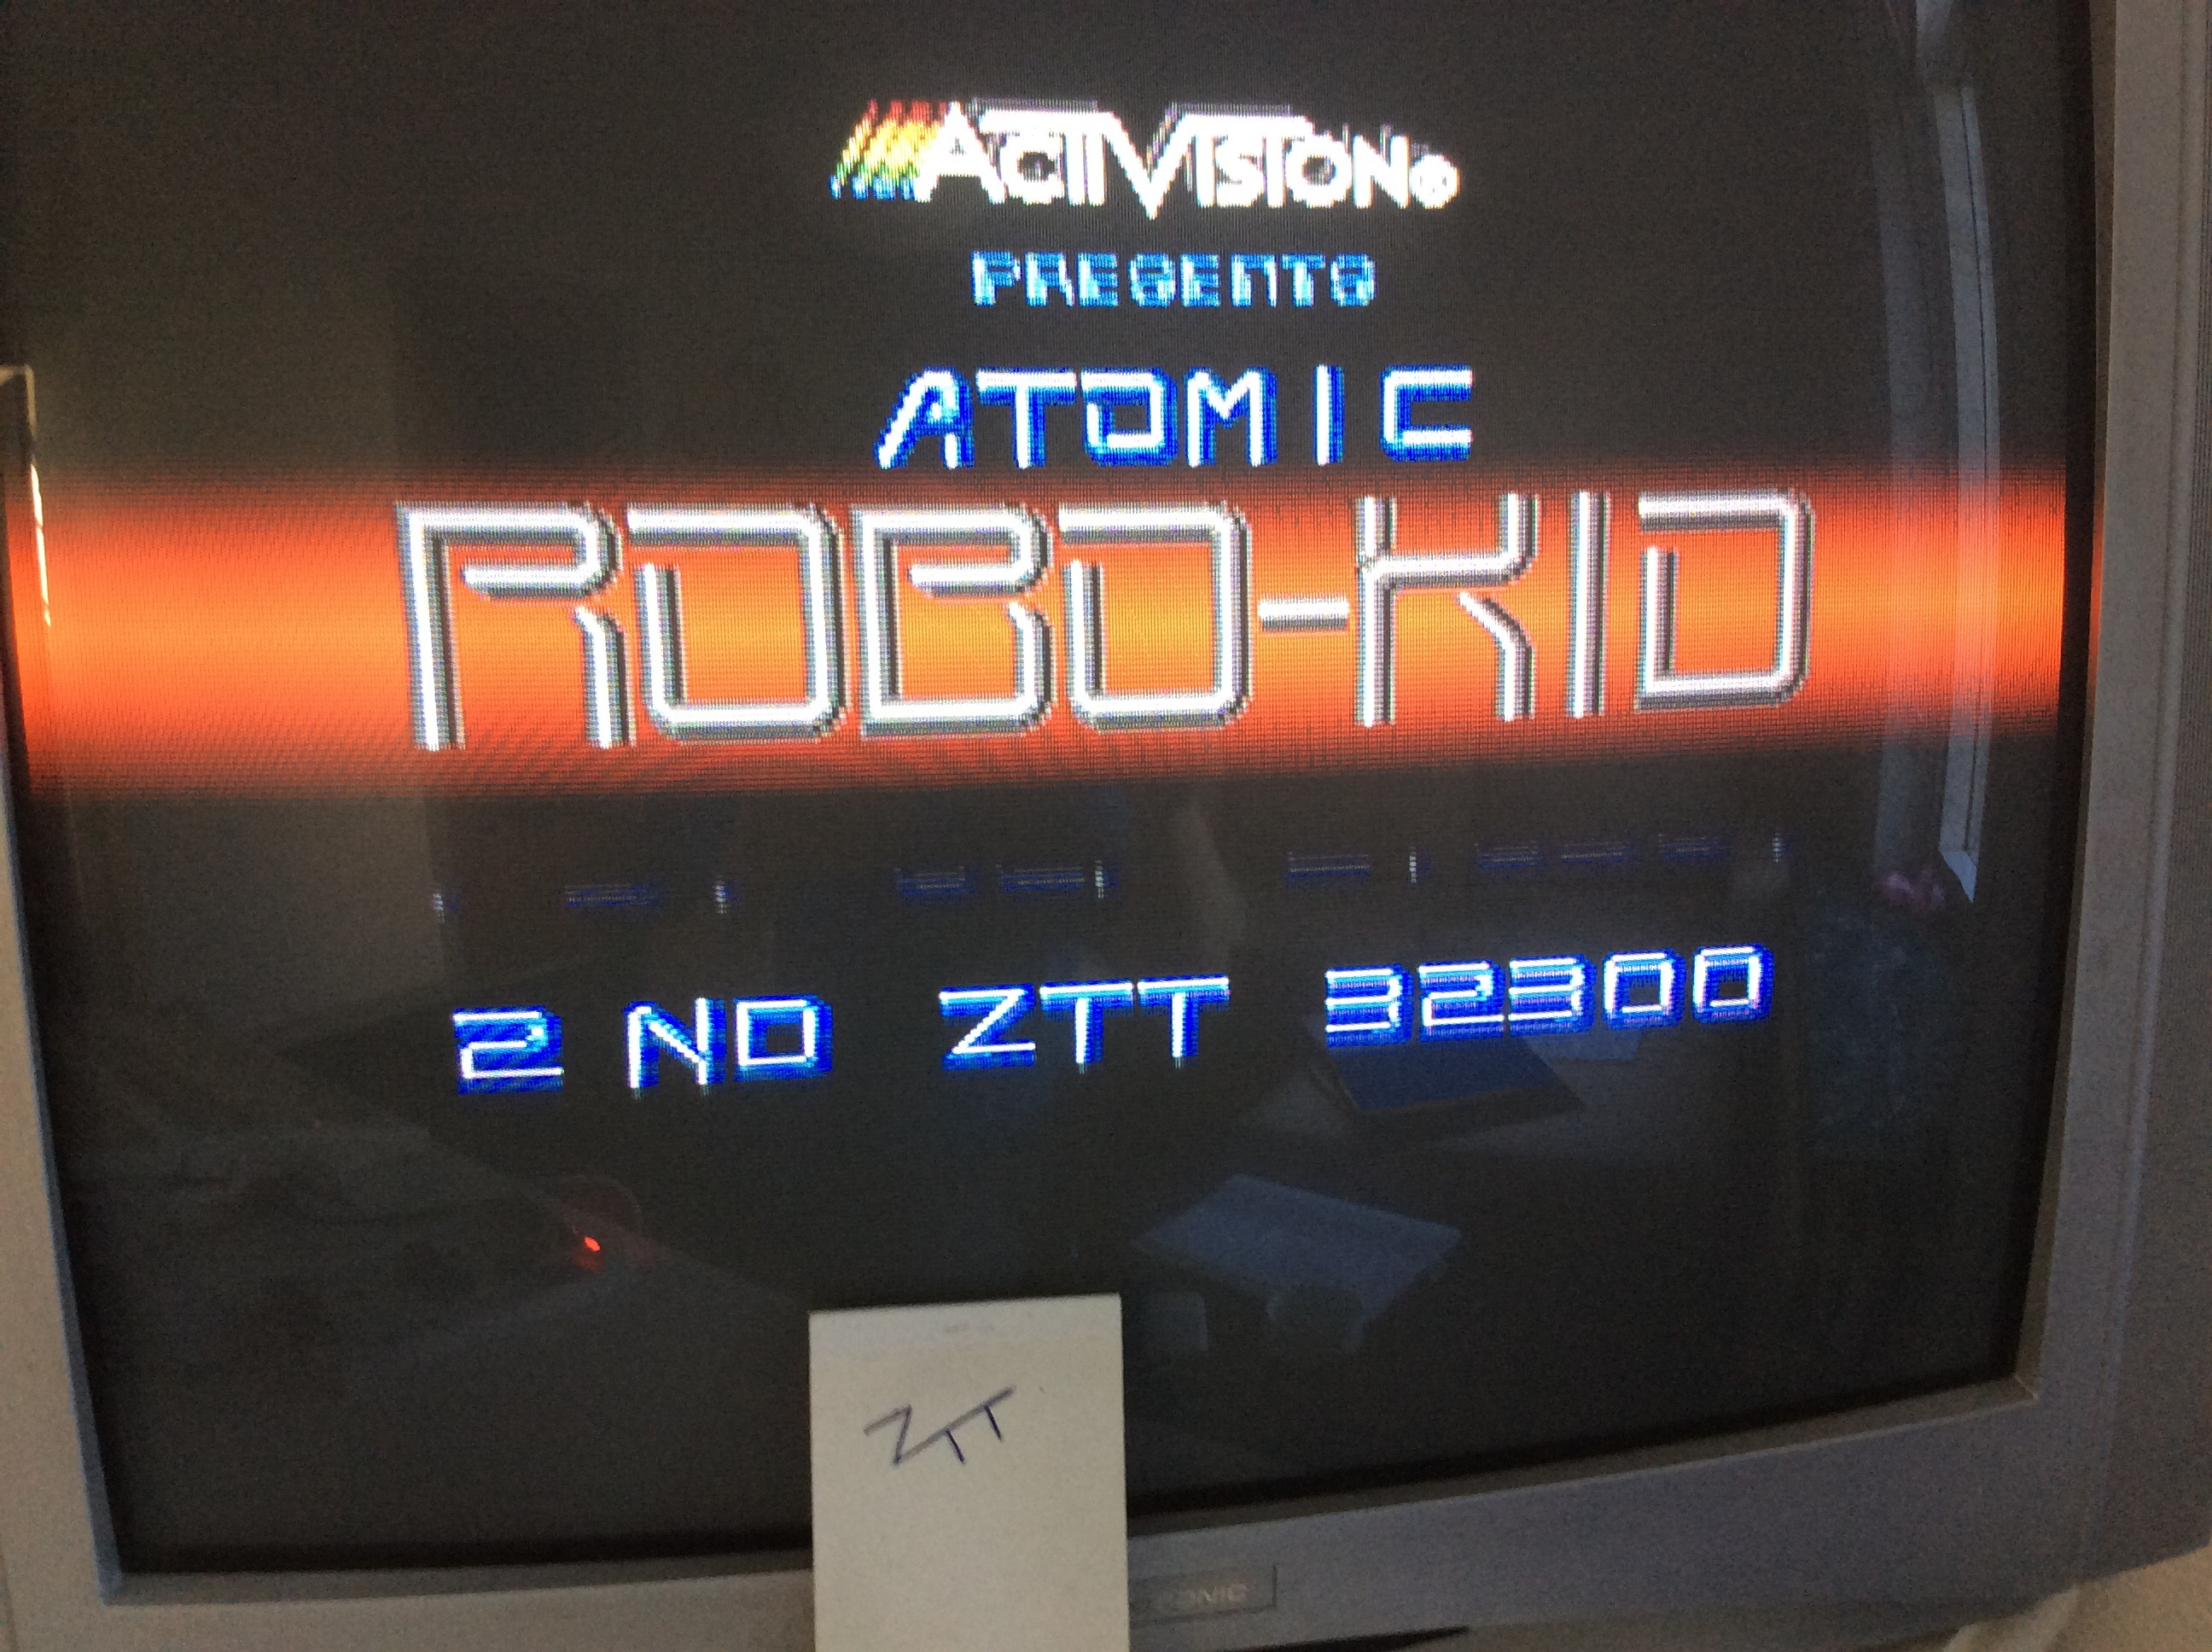 Frankie: Atomic Robo-Kid (Amiga) 32,300 points on 2016-07-20 12:07:08